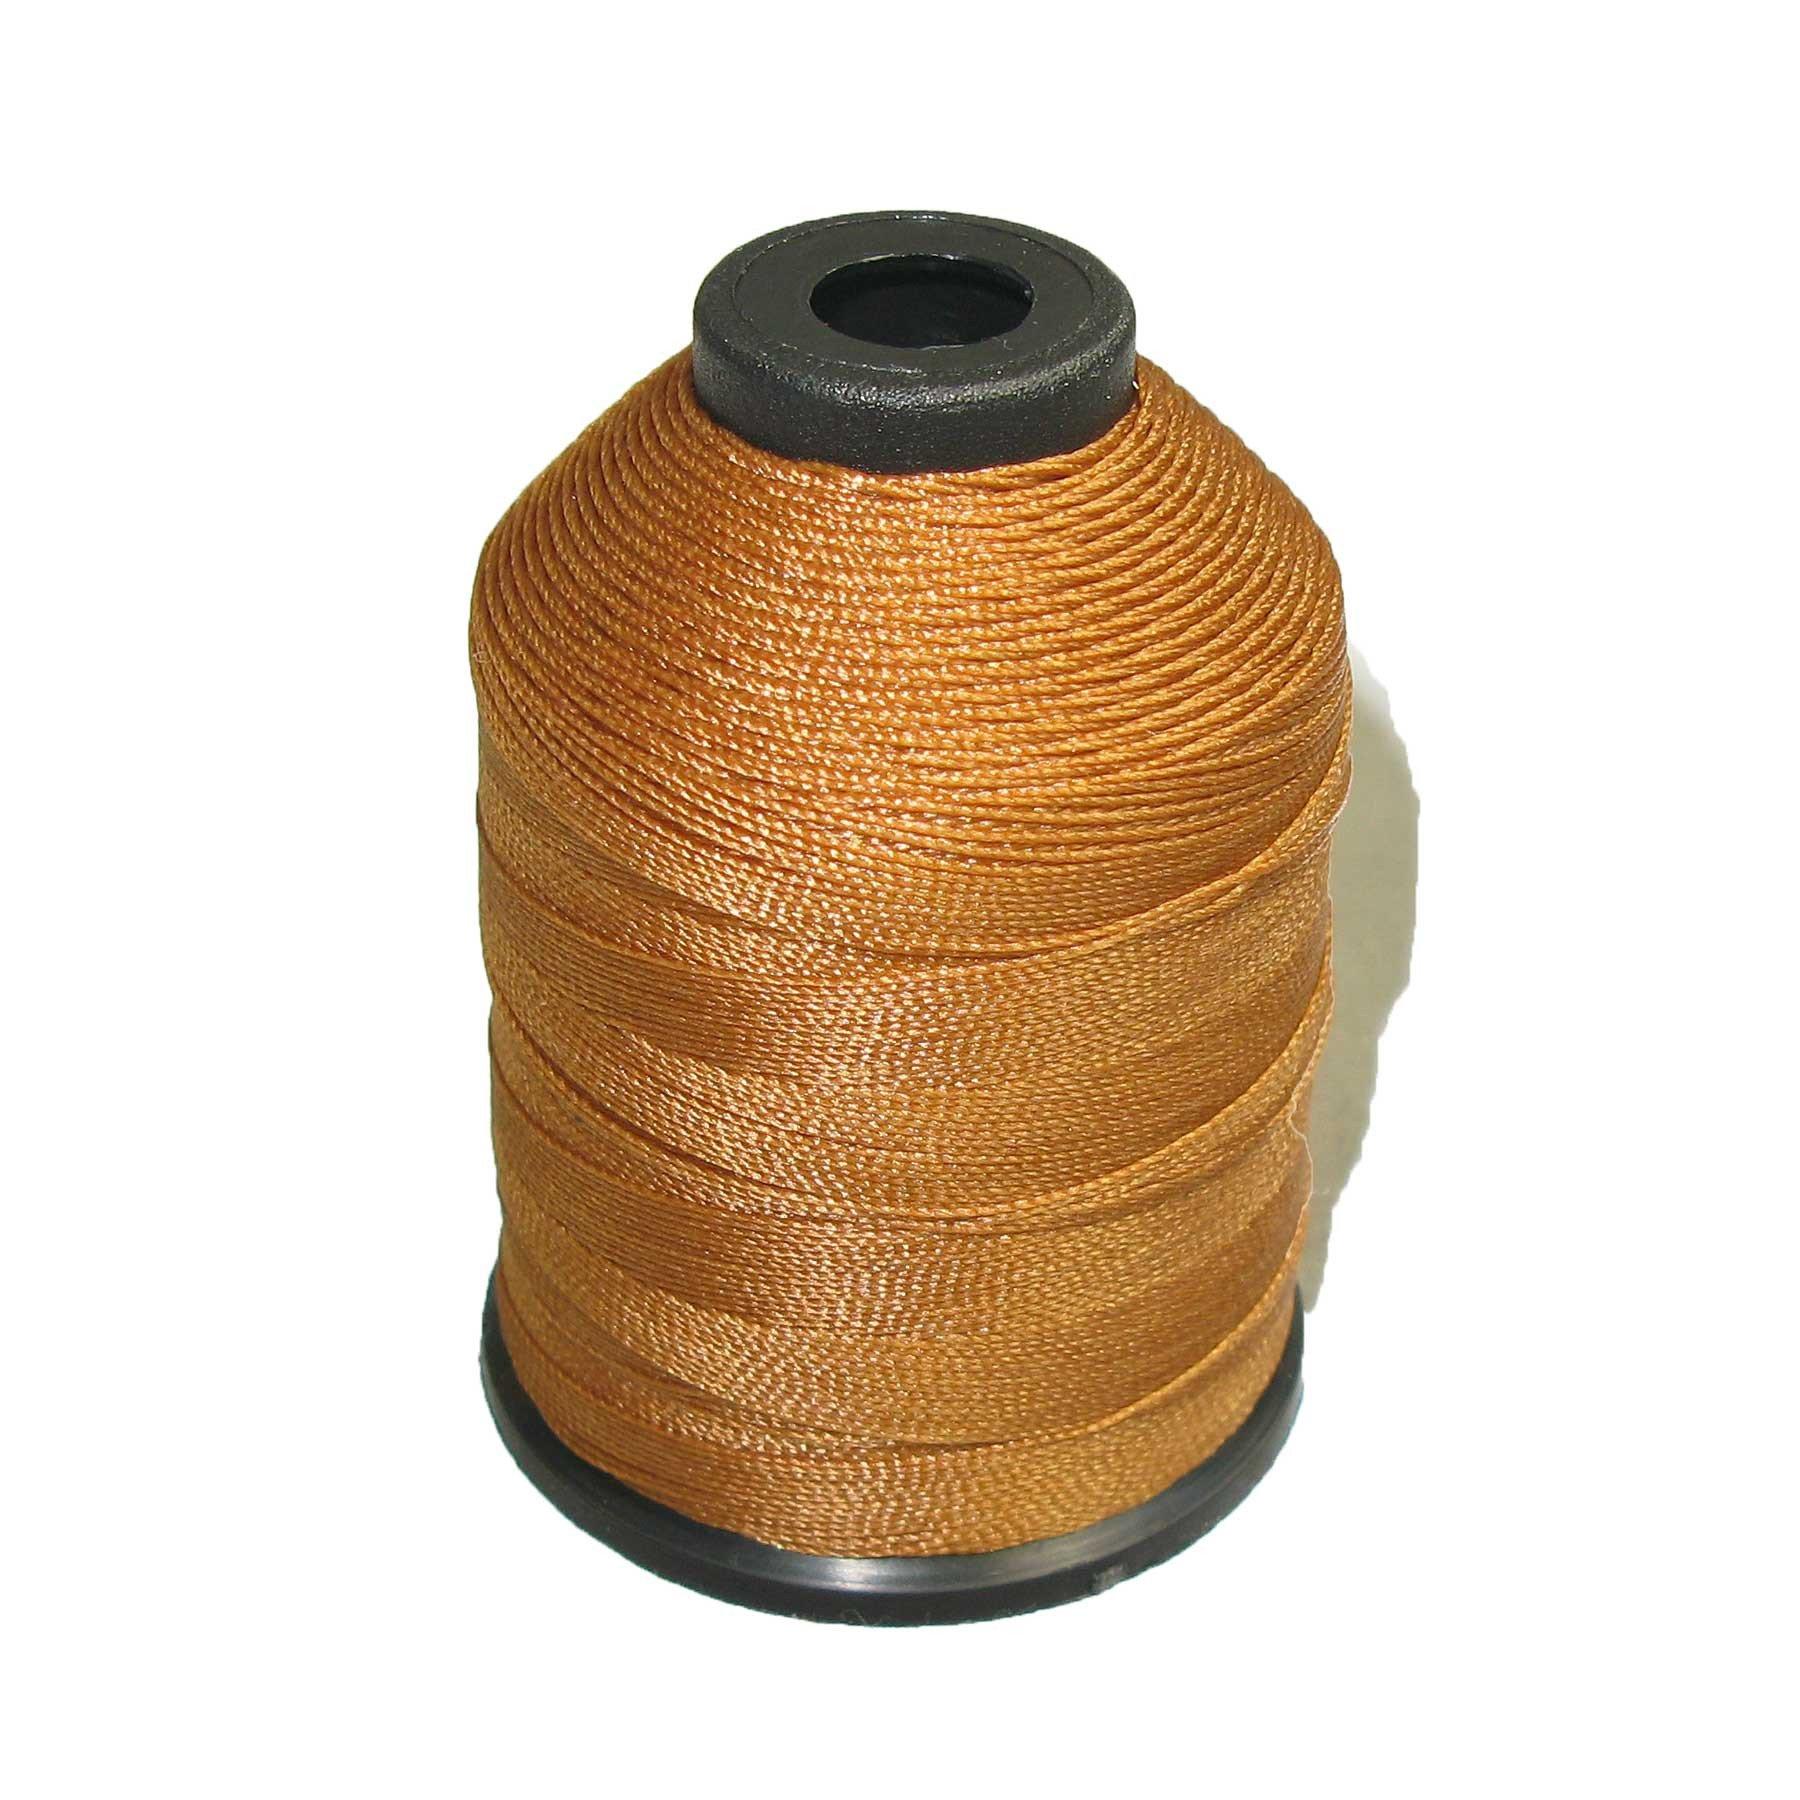 Tex 70 Premium Bonded Nylon Sewing Thread #69 for Leather - Fuchsia